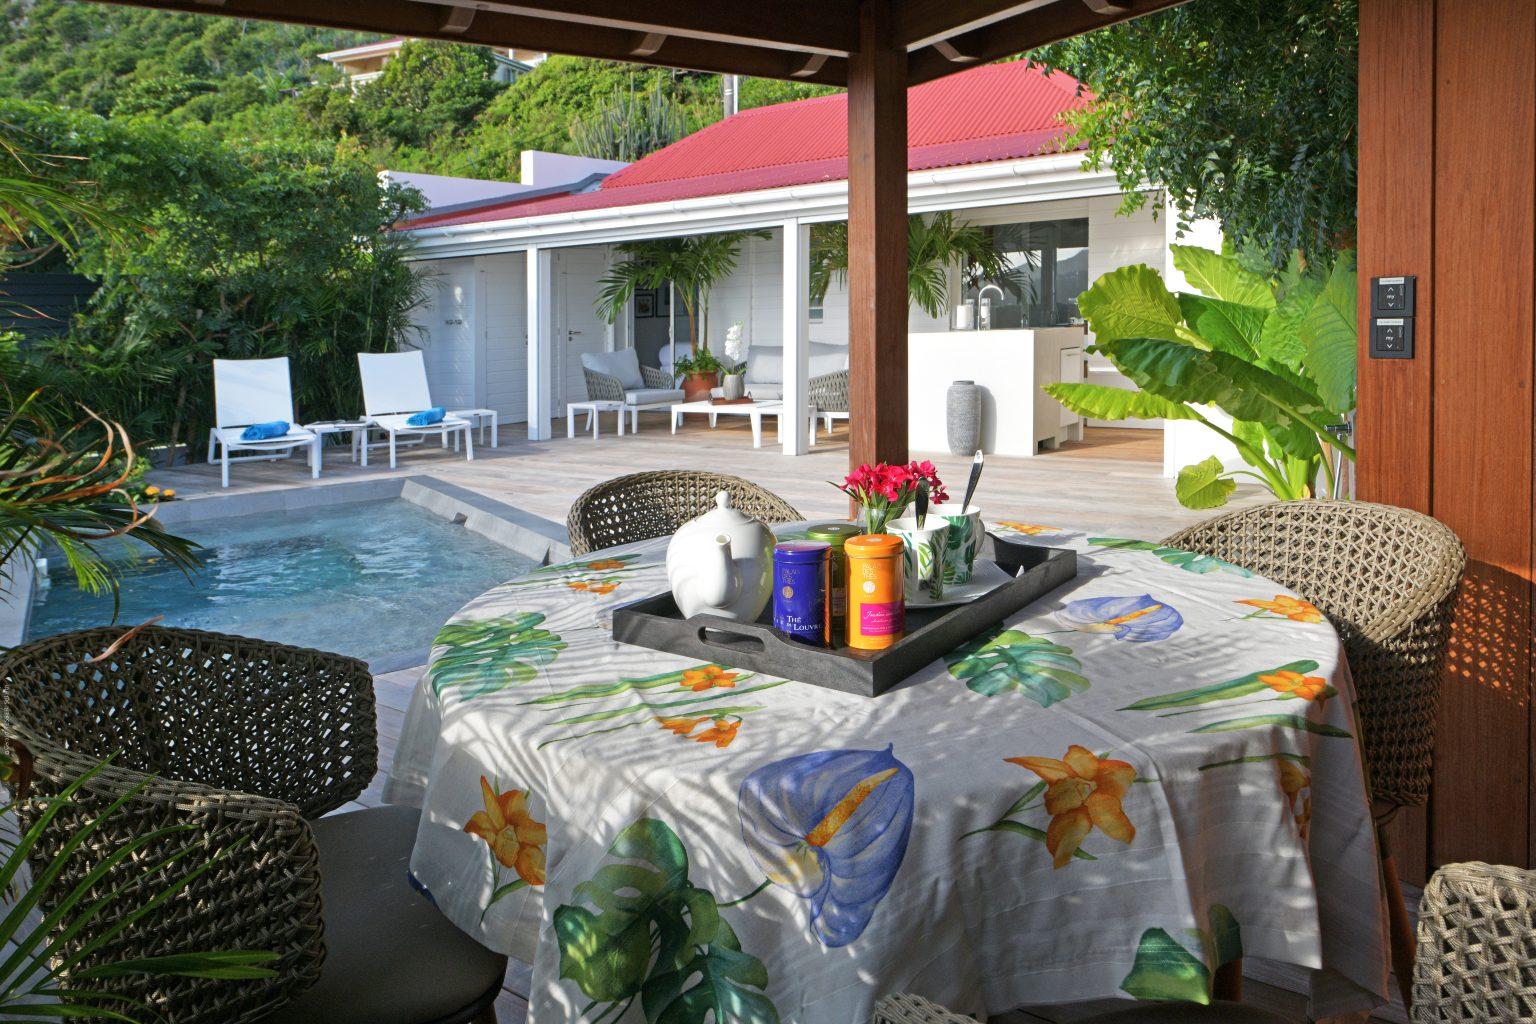 Villa Silhouette - Small Villa Rental St Barth Anse de Cayes Ocean View - Outside view